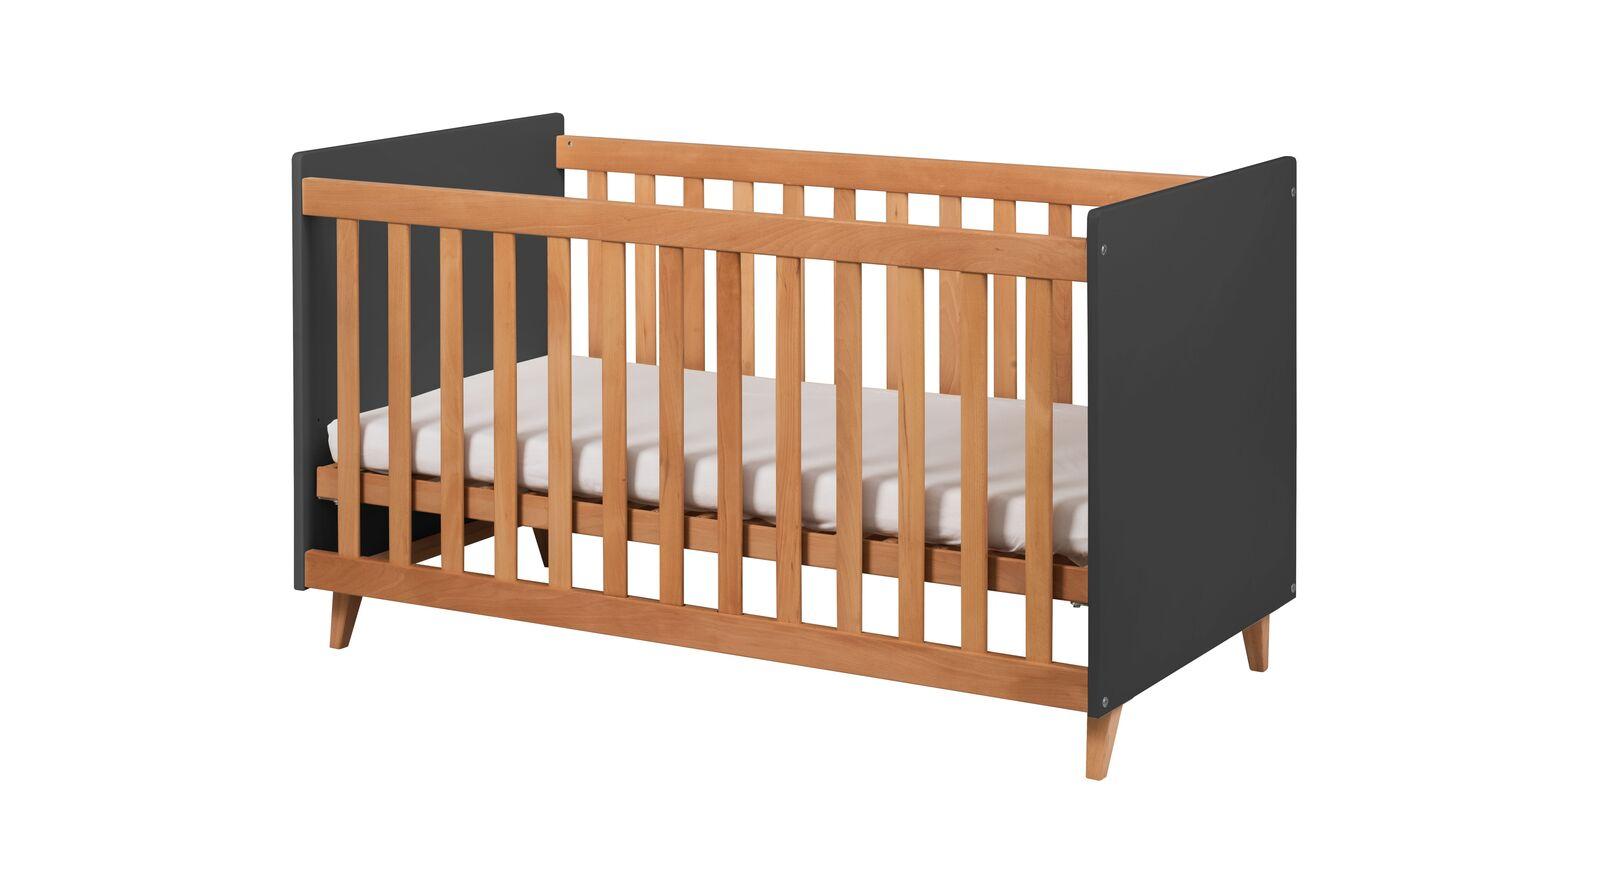 Babybett Kids Nordic aus anthrazitfarbenem Dekor